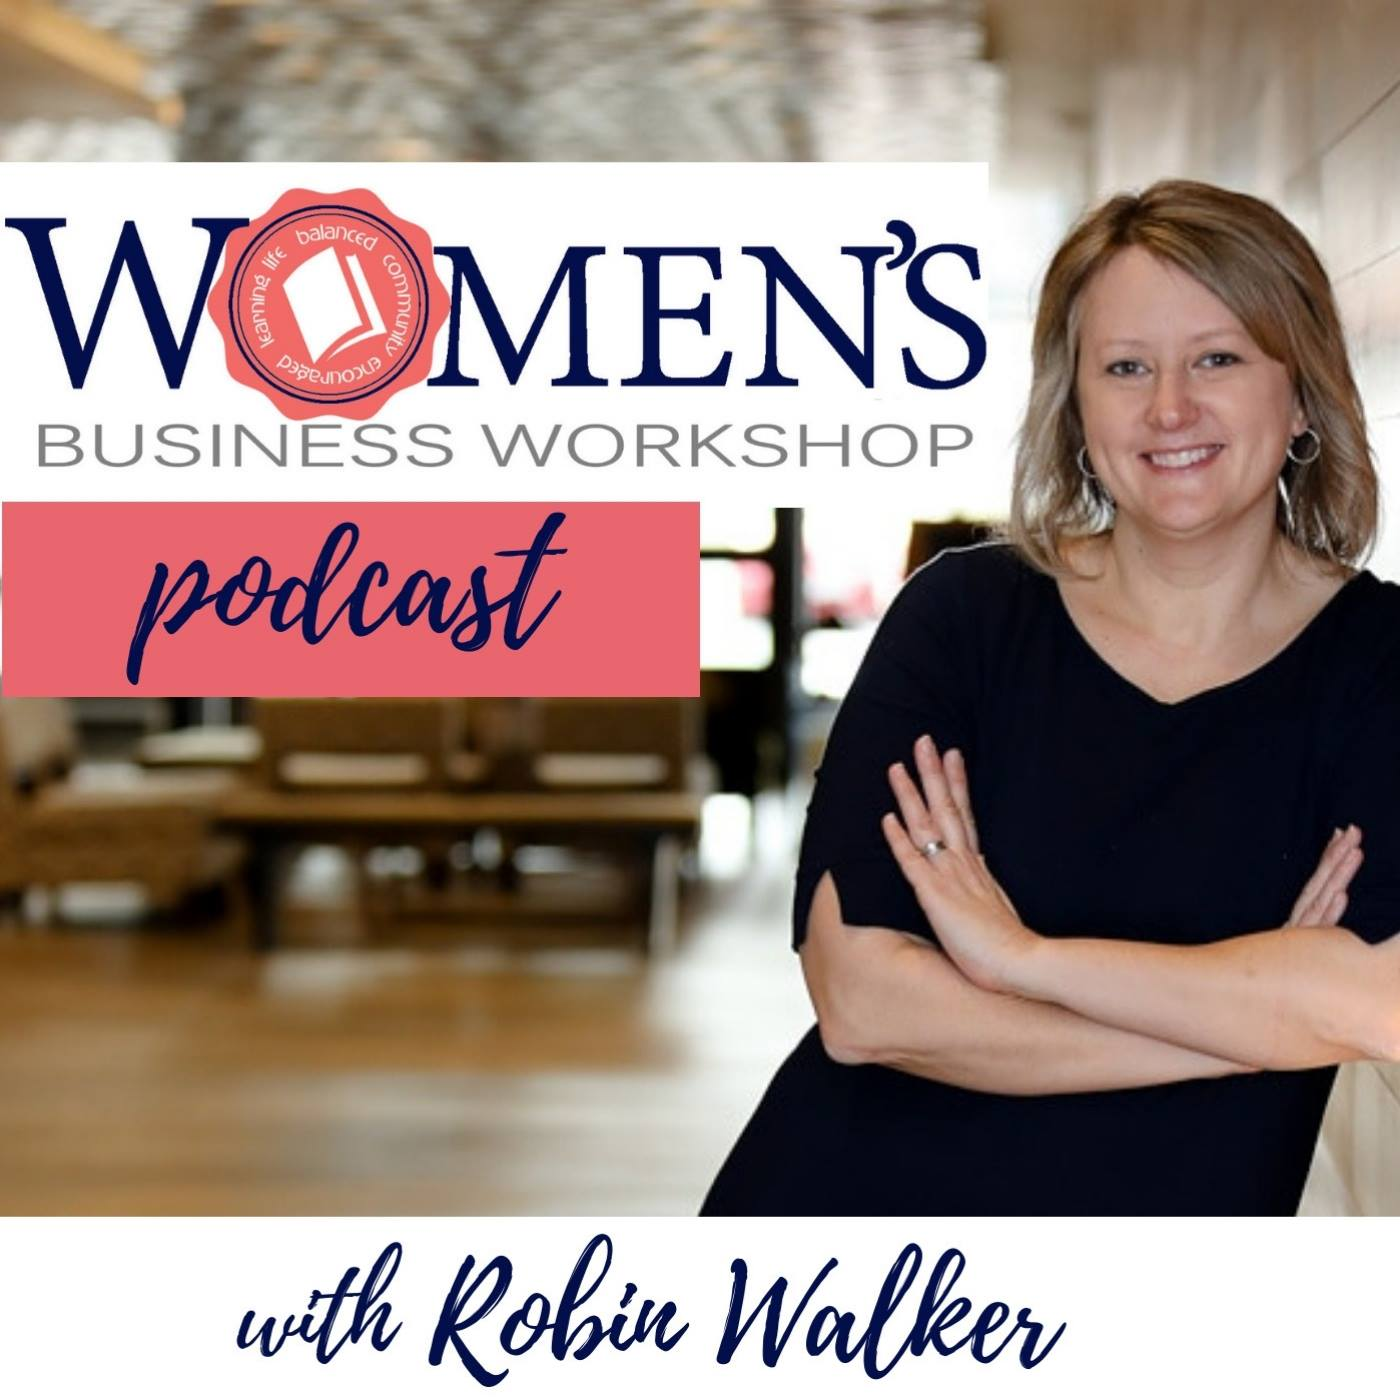 Women's Business Workshop Podcast